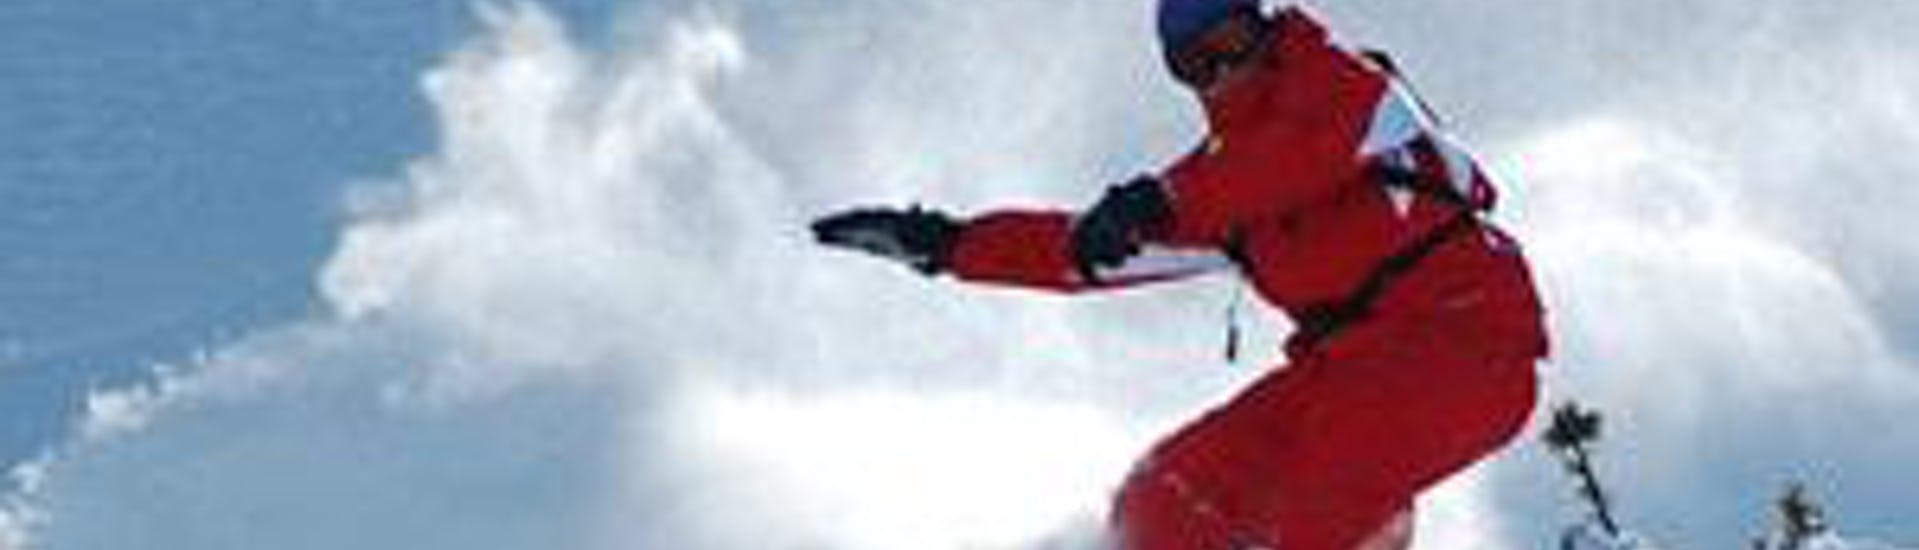 Snowboardkurs - Alle Altersgruppen & Levels